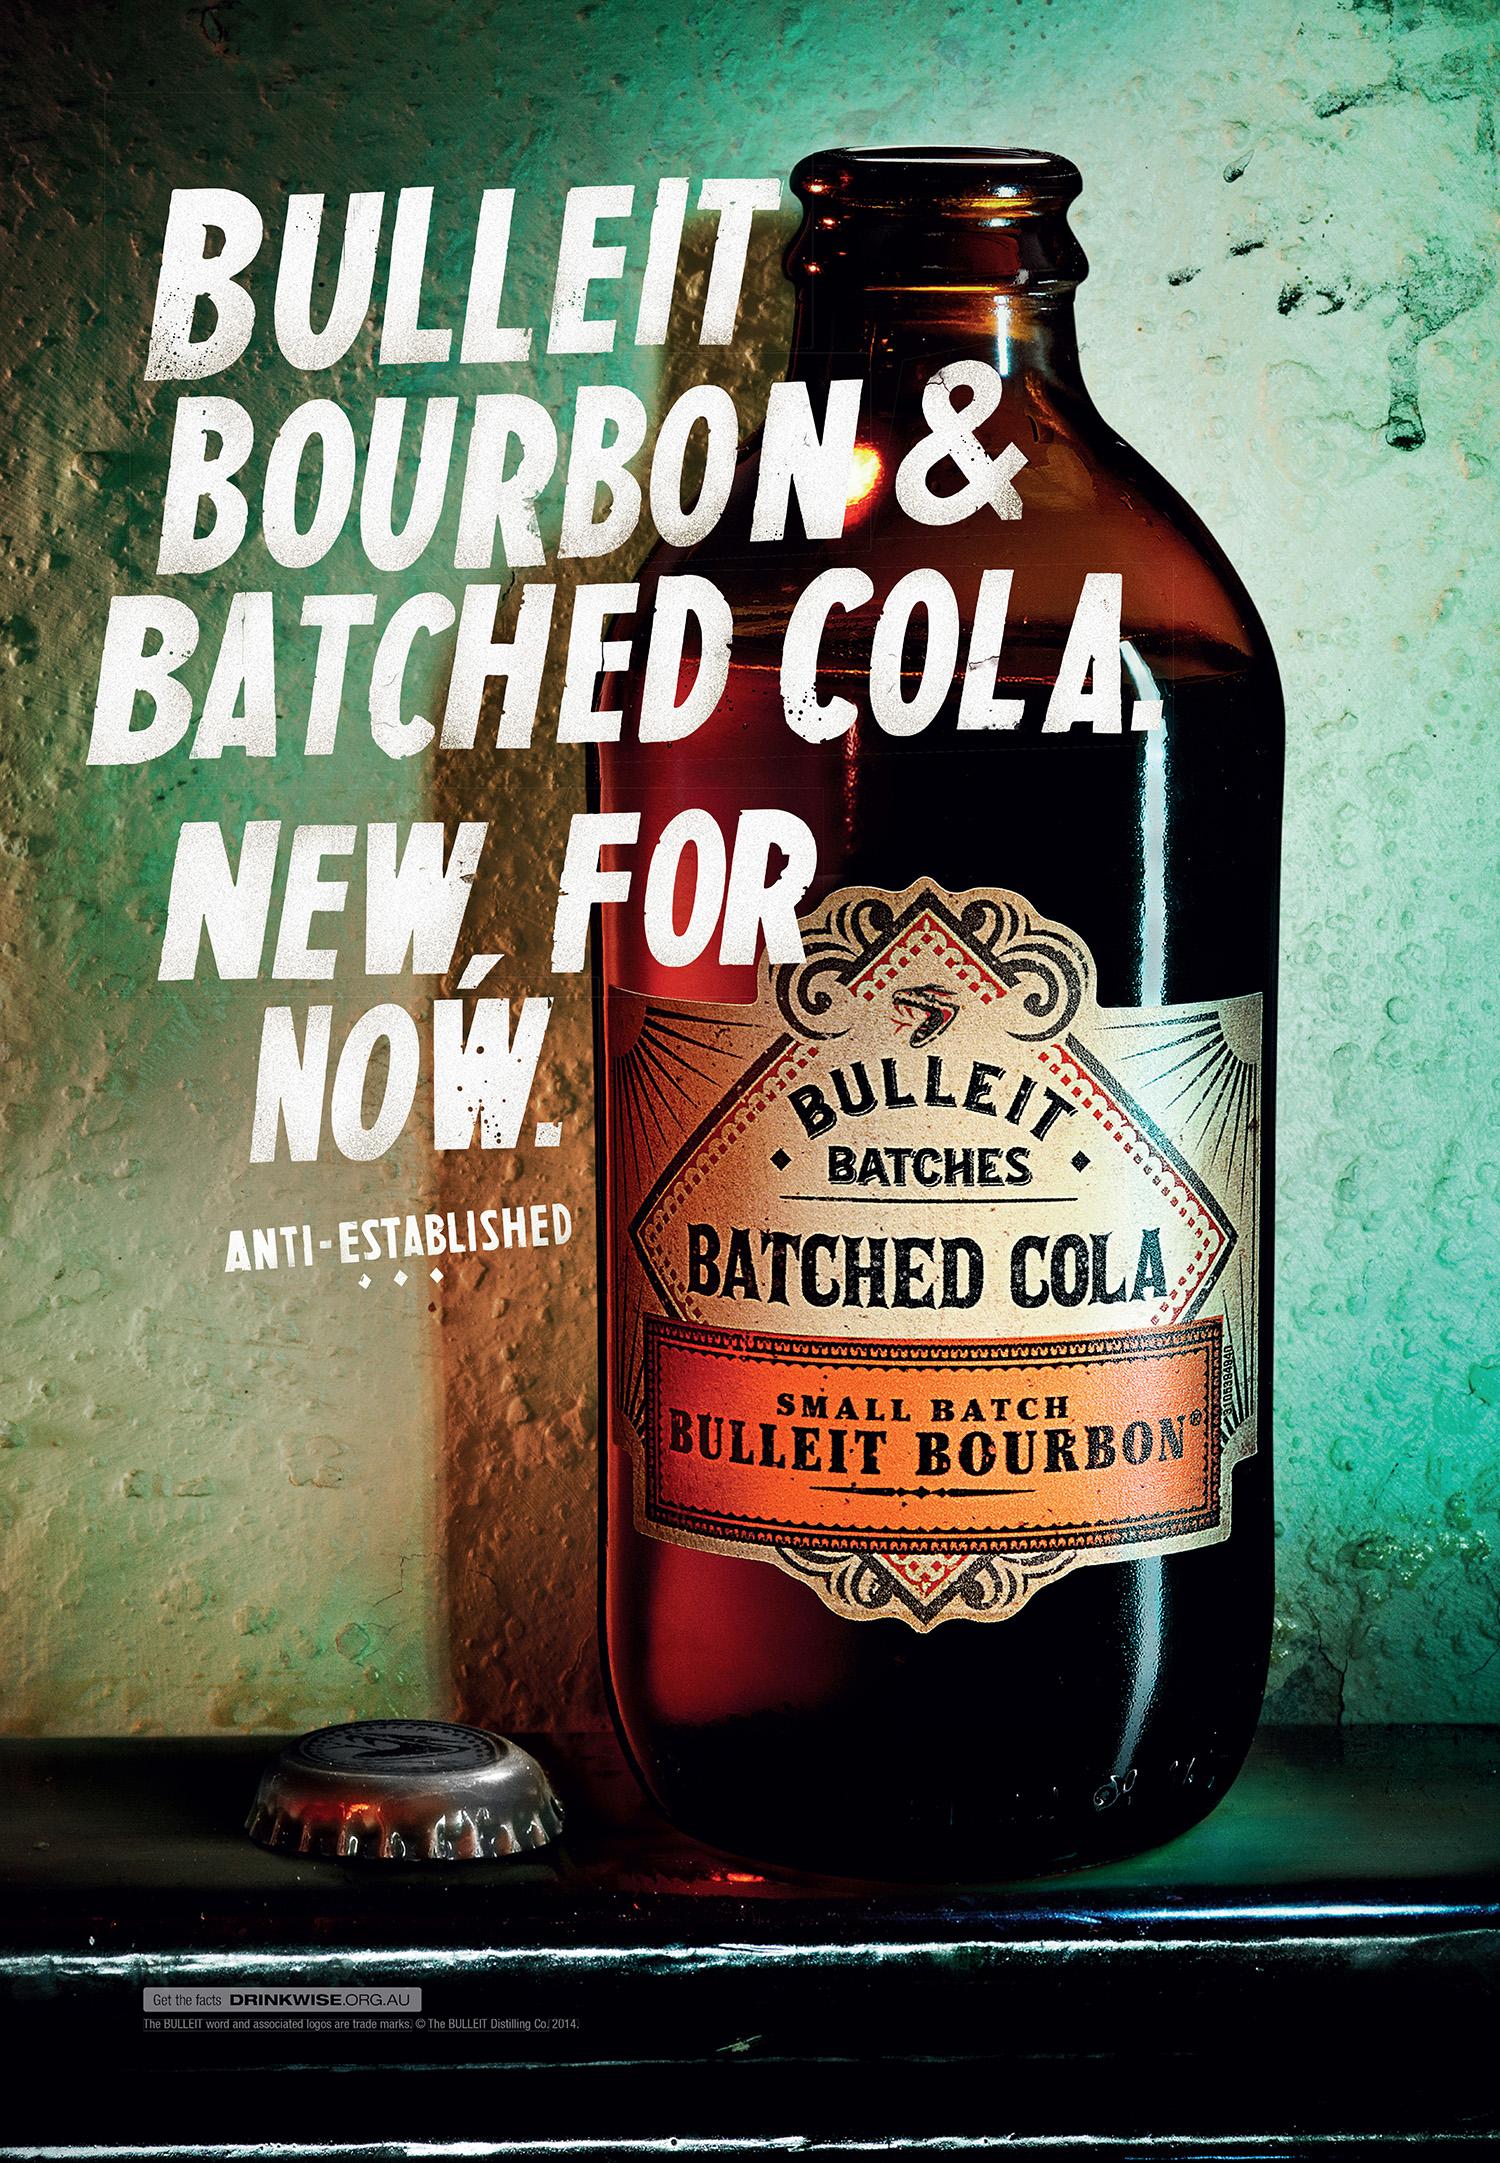 Bulleit Bourbon  Agency:Leo Burnett  Art Director: Ben Alden  Copywriter: Michael Dawson  Retouching: Cream Retouching